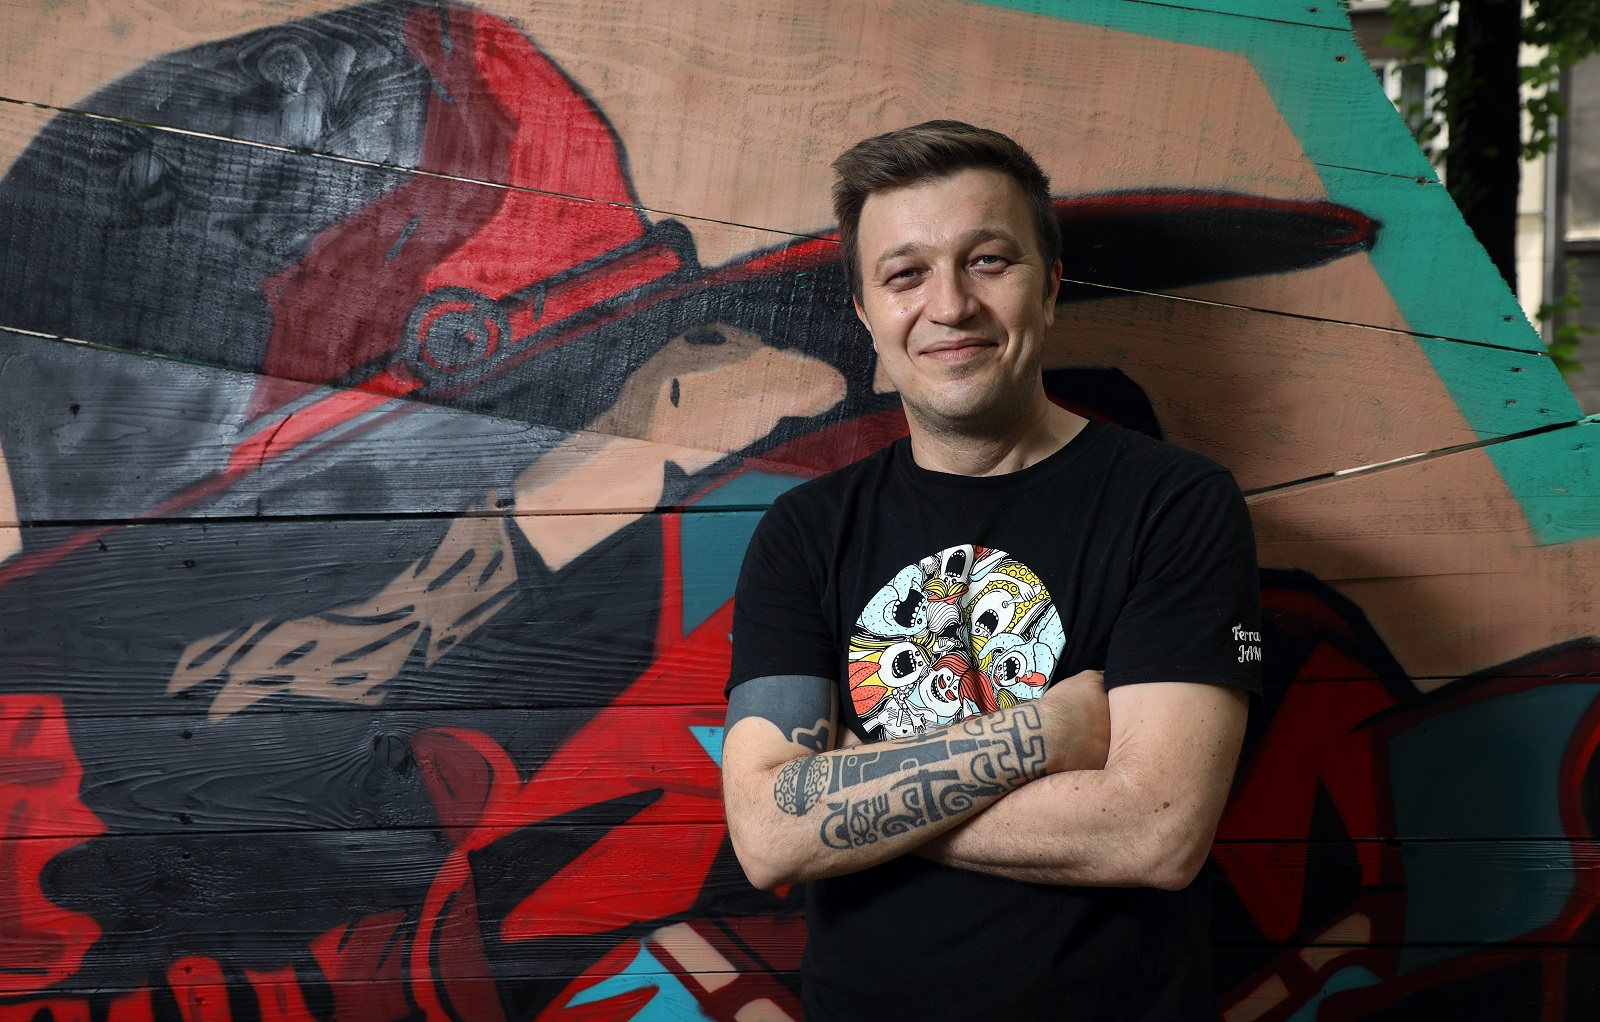 Zagreb, 250620. Ribnjak, Art park. Glazebenik Edo Maajka, bosansko-hercegovacki reper i hip-hop tekstopisac. Foto: Damjan Tadic / CROPIX